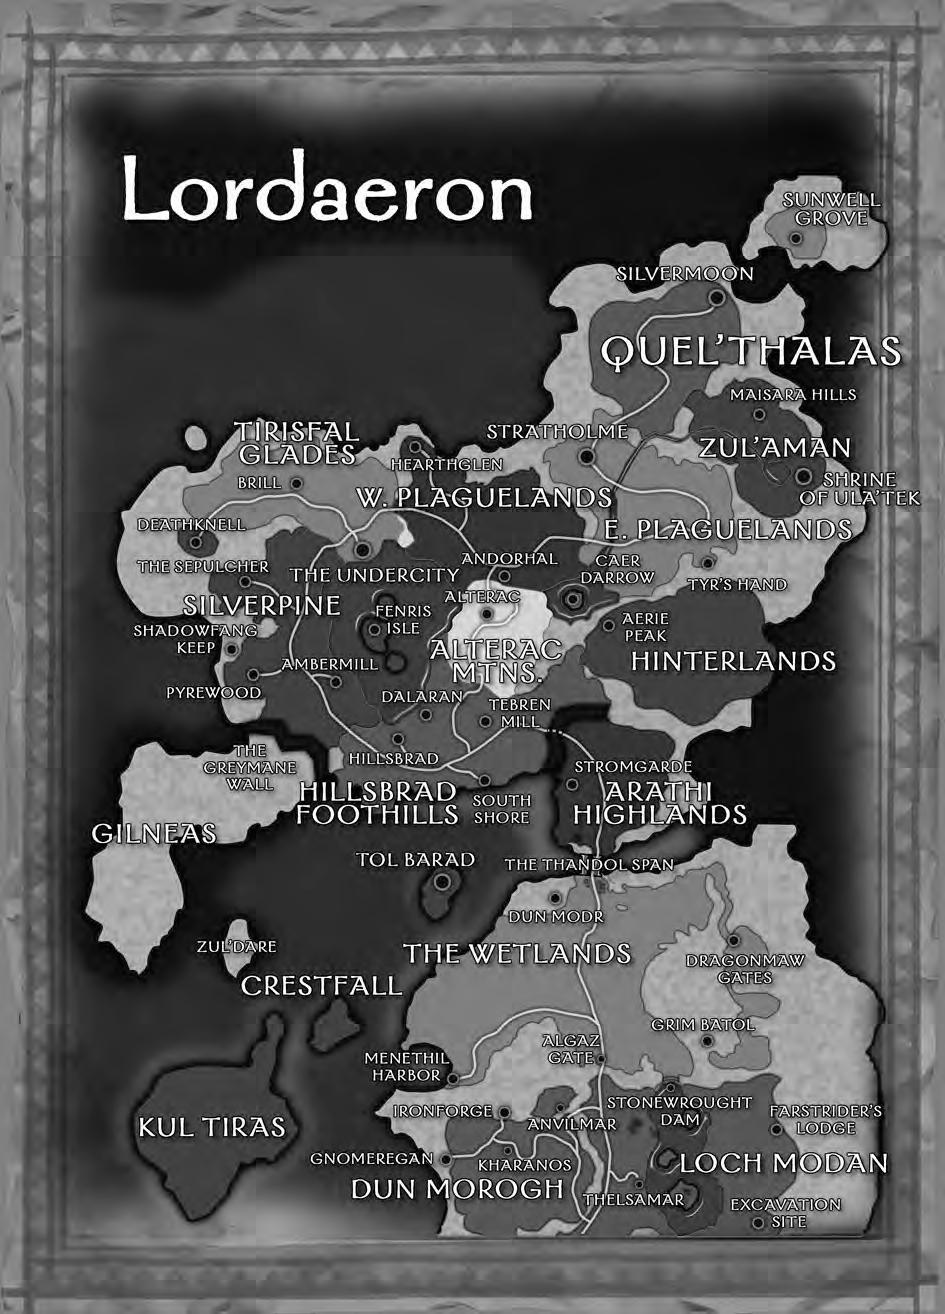 LordaeronLoC